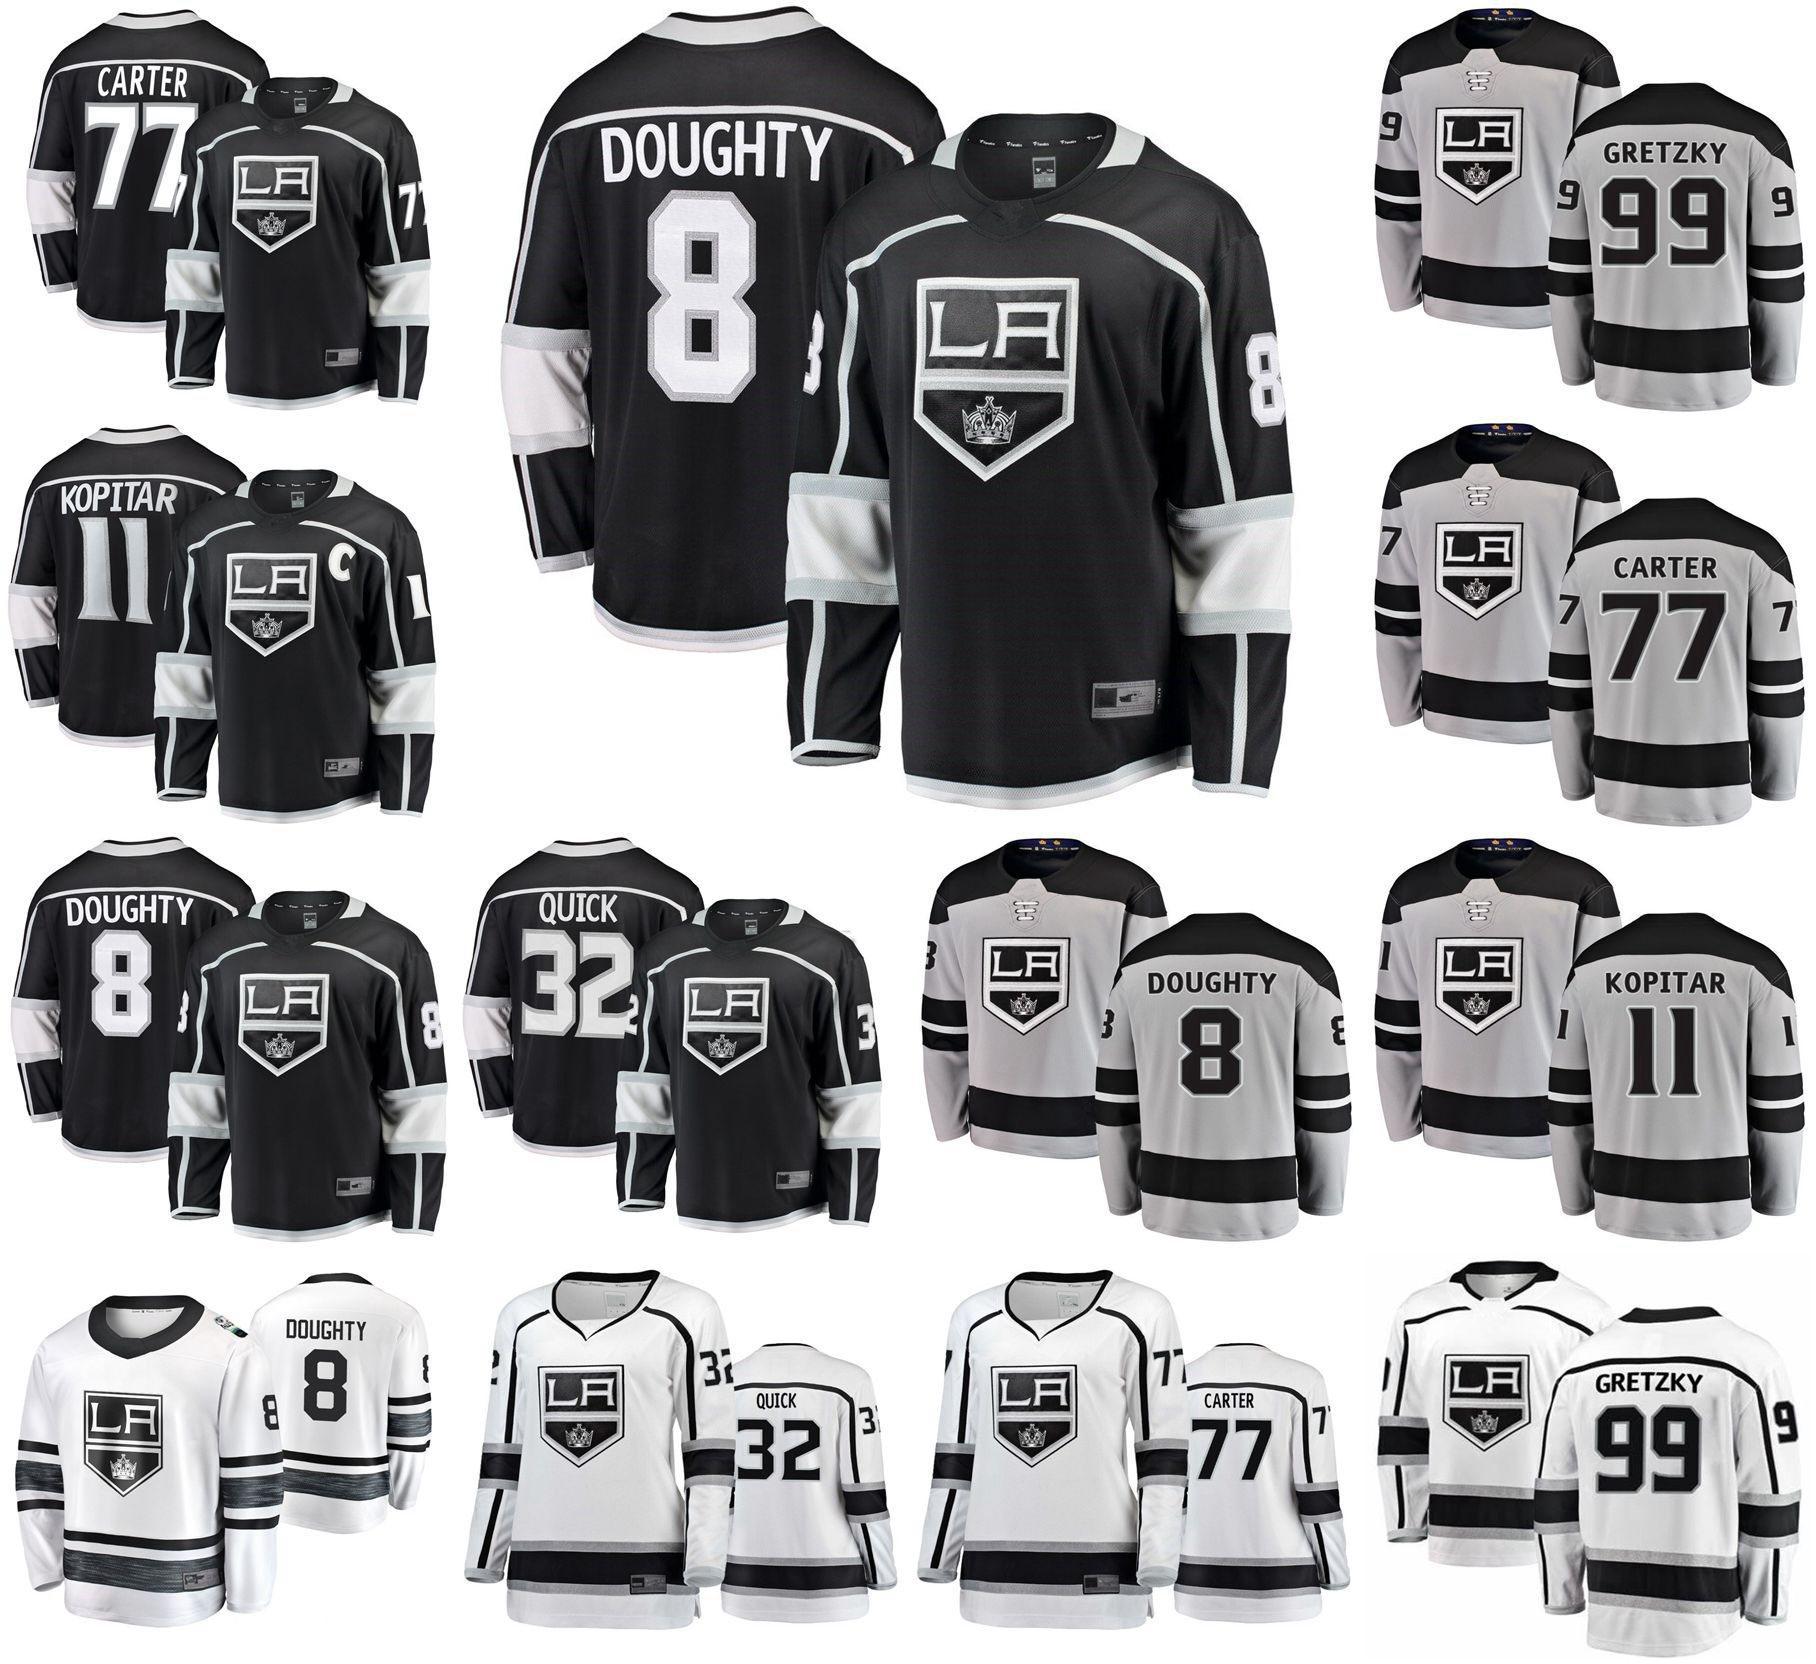 Los Angeles Kings Jerseys 11 Anze Kopitar Jersey 32 Jonathan Quick 77 Jeff Carter 8 Drew Doughty 99 Wayne Gretzky Hockey Jerseys genähtes